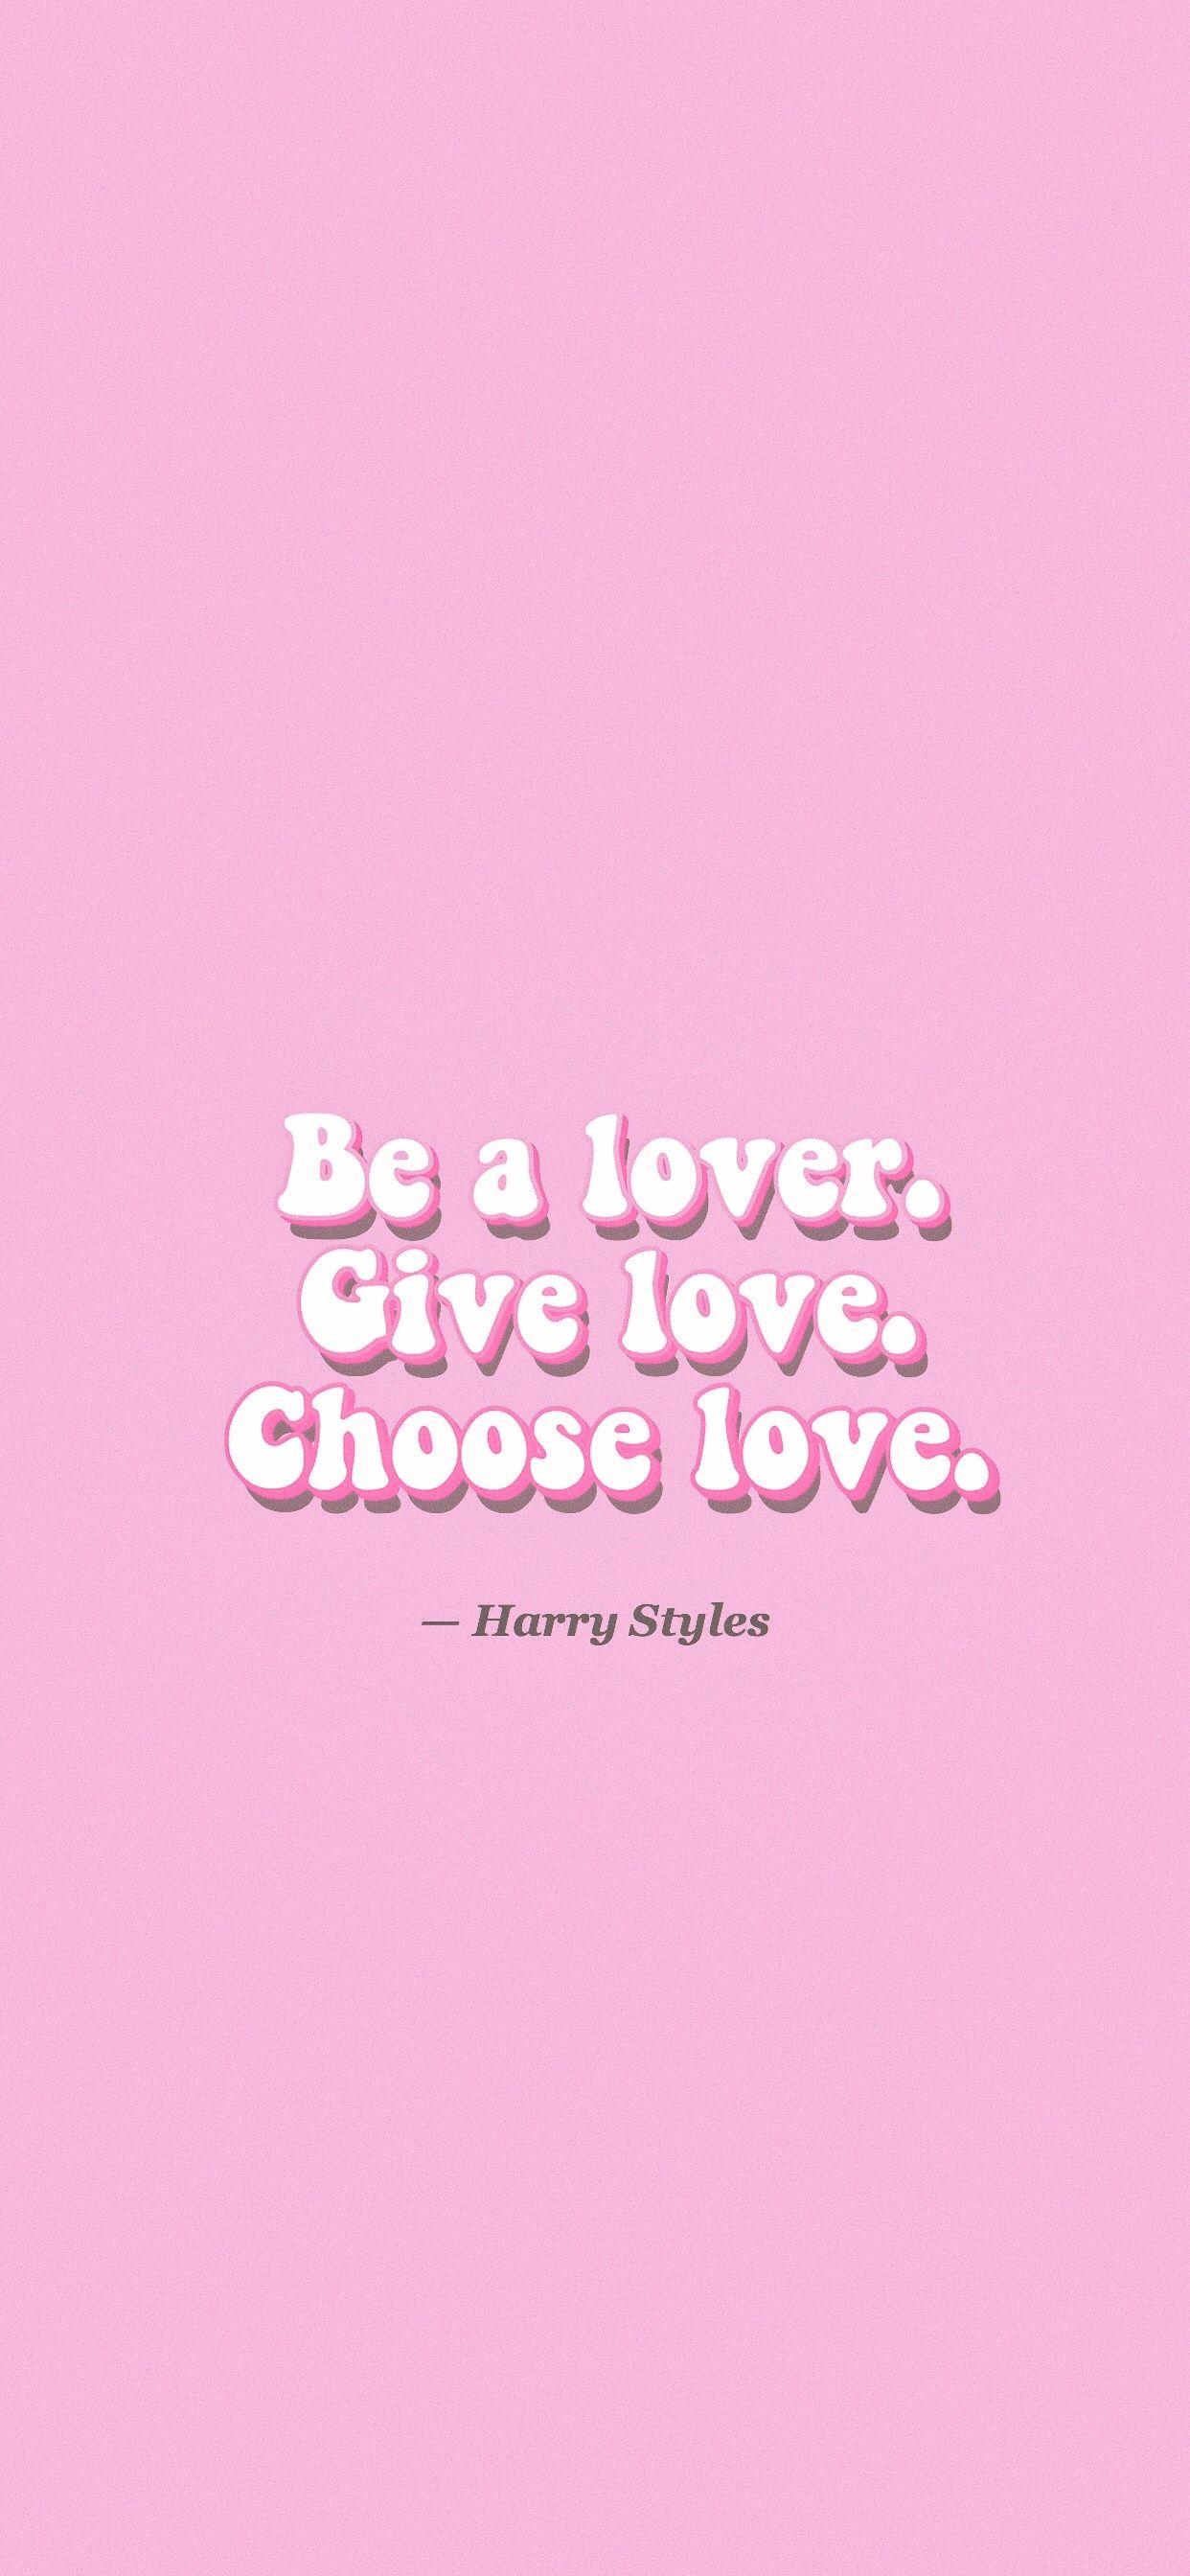 Harry Styles Lockscreen In 2020 Harry Styles Quotes Harry Styles Drawing Harry Styles Lockscreen